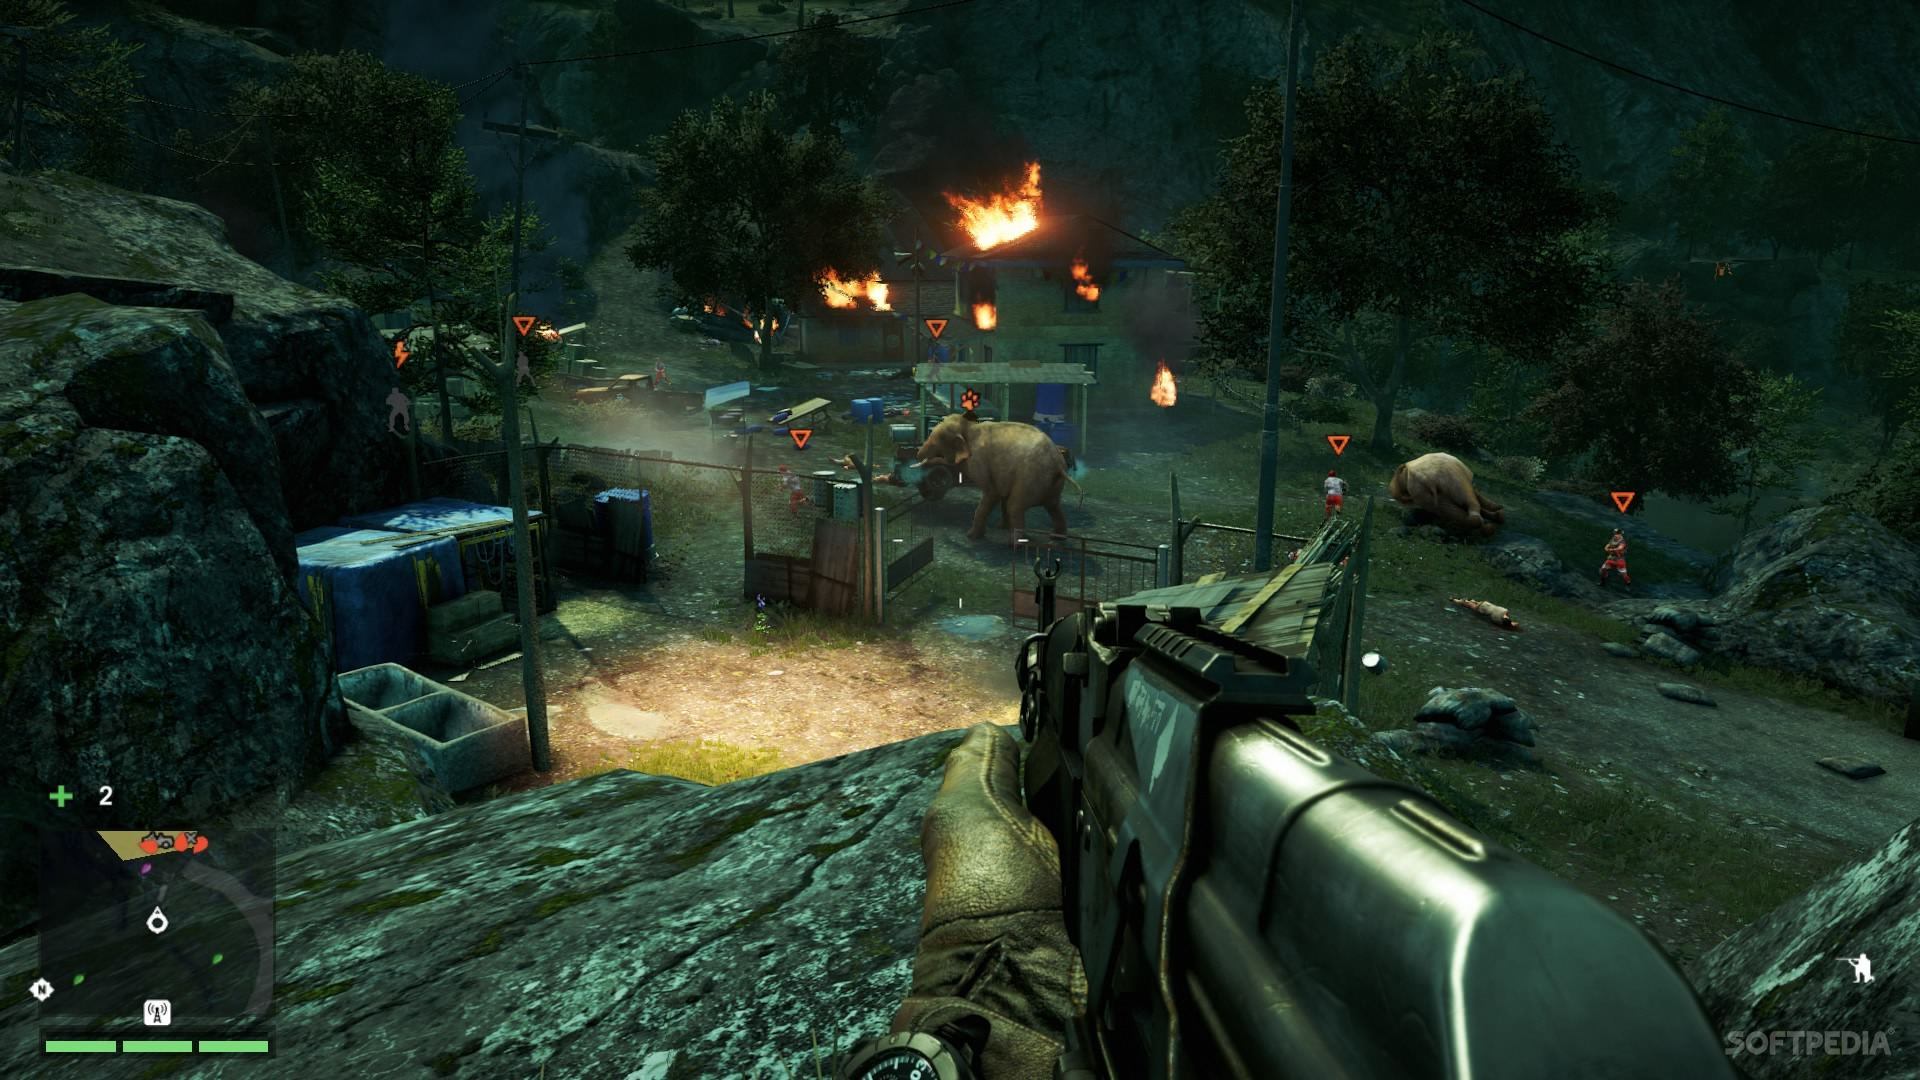 Far Cry 4 Gets Escape From Durgesh Prison Dlc Next Month Has Permanent Death